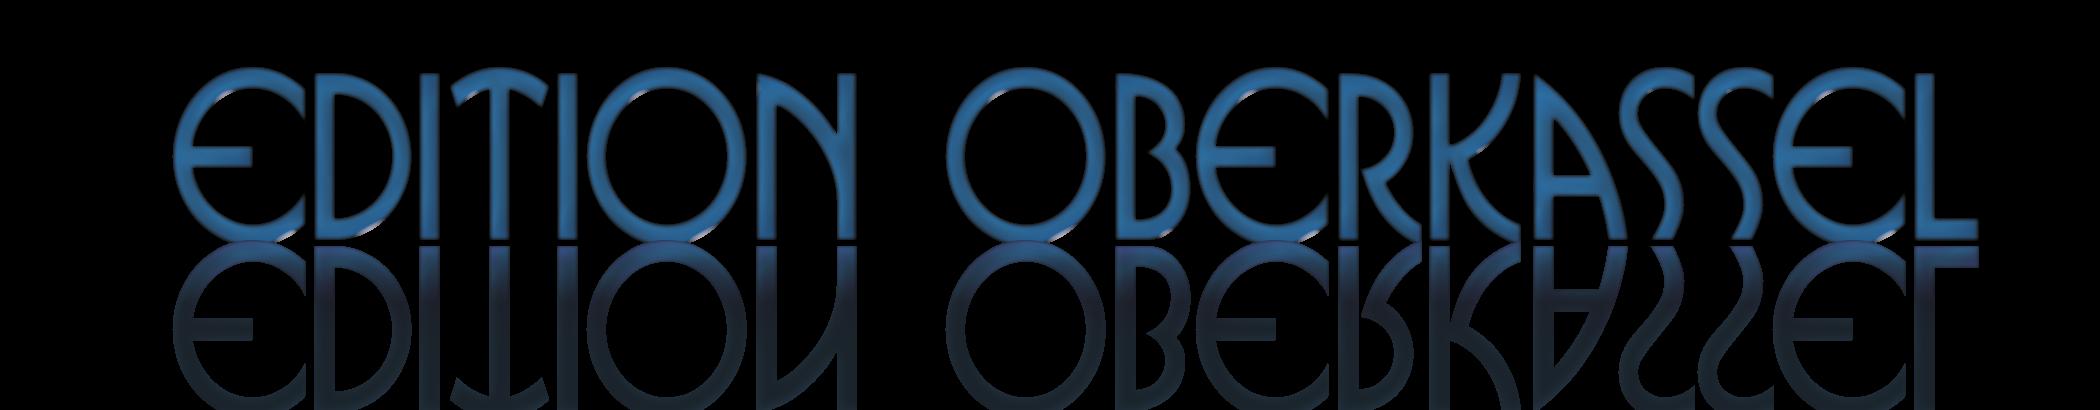 Edition Oberkassel